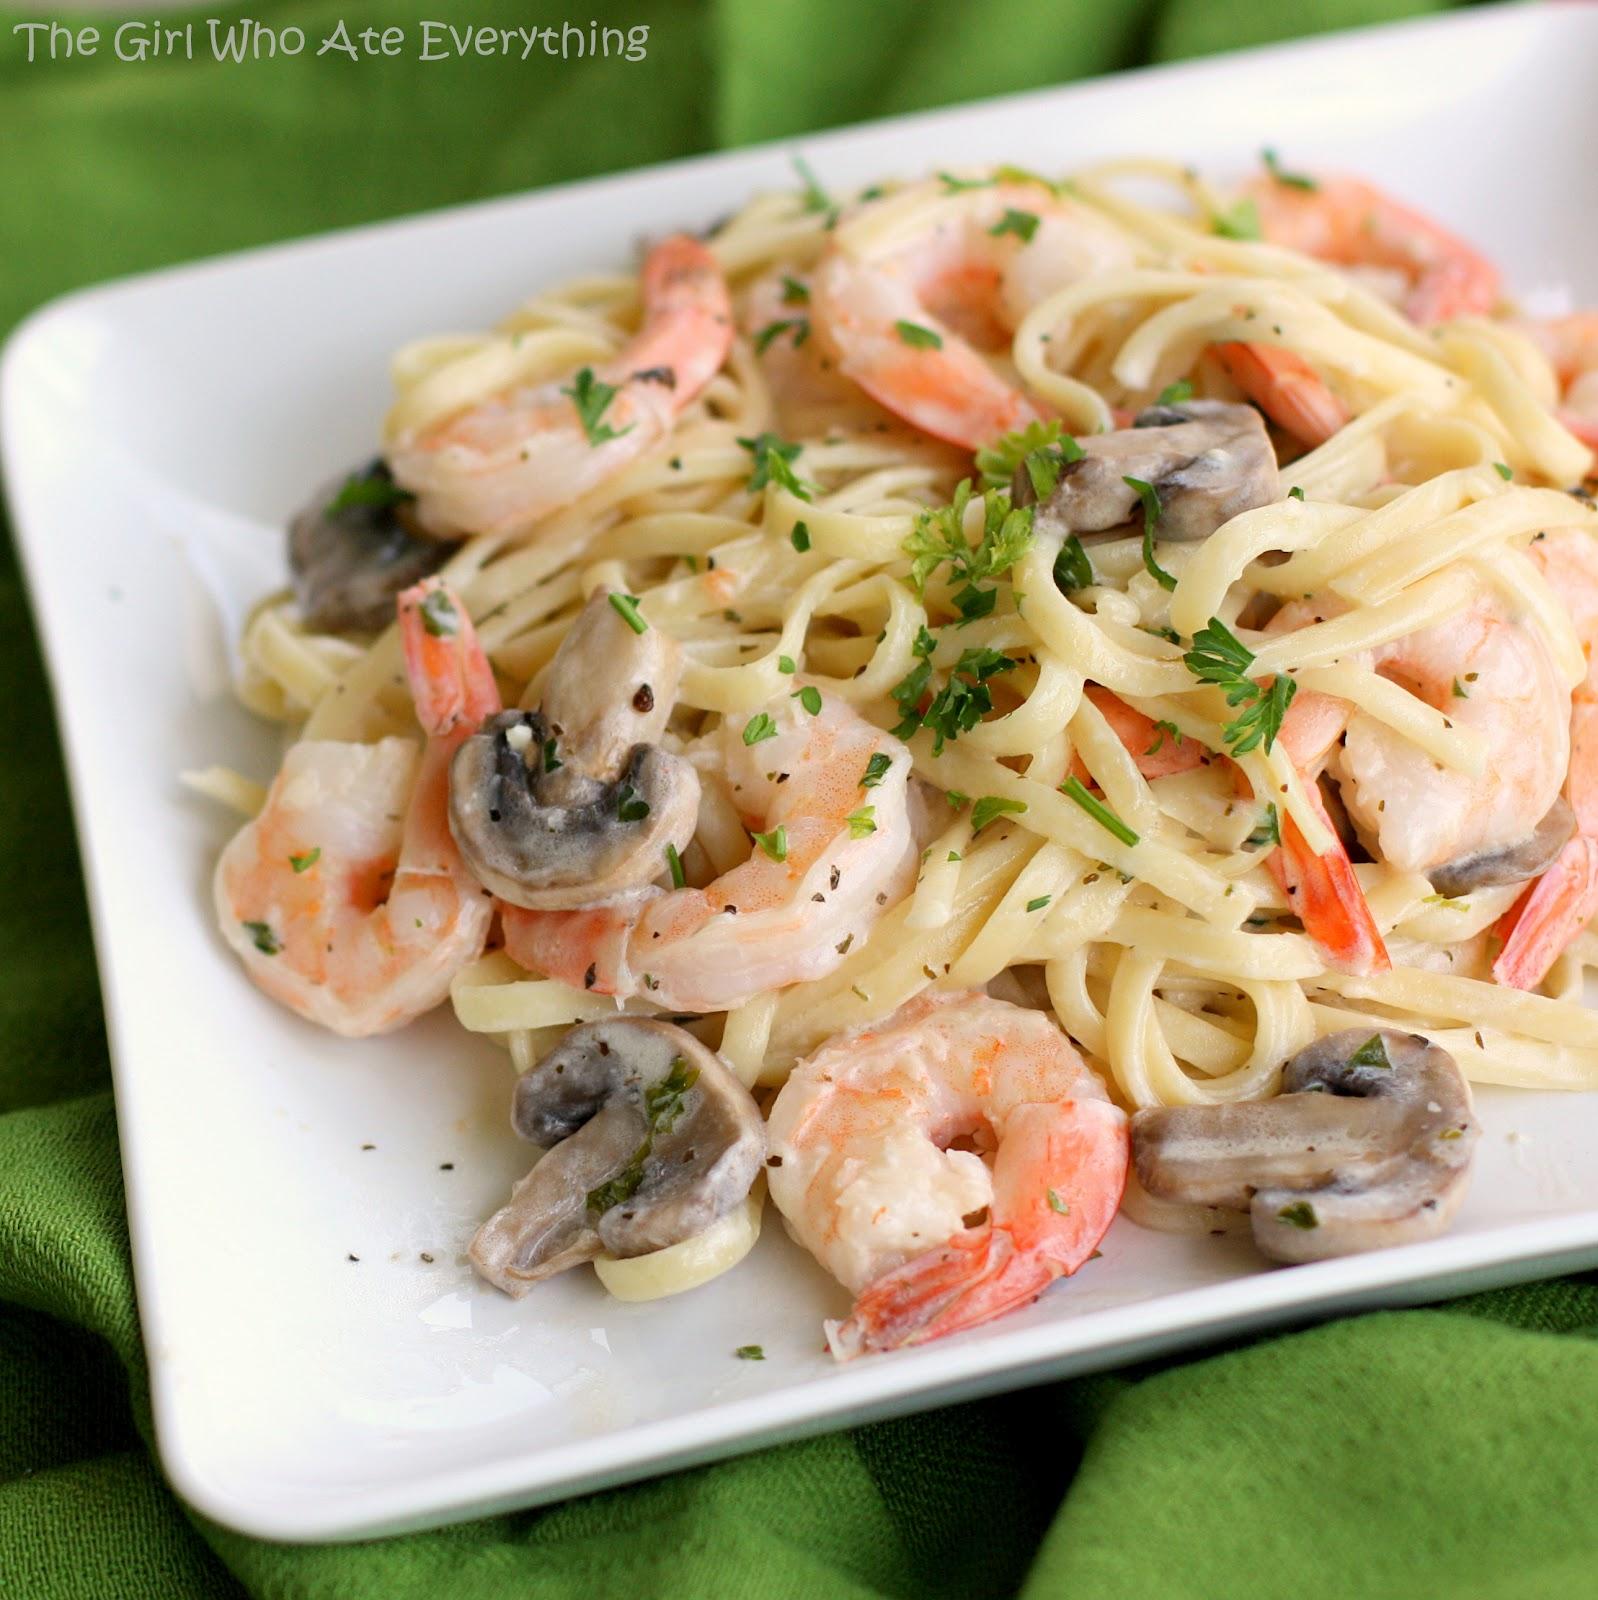 Creamy Shrimp Pasta with Mushrooms image